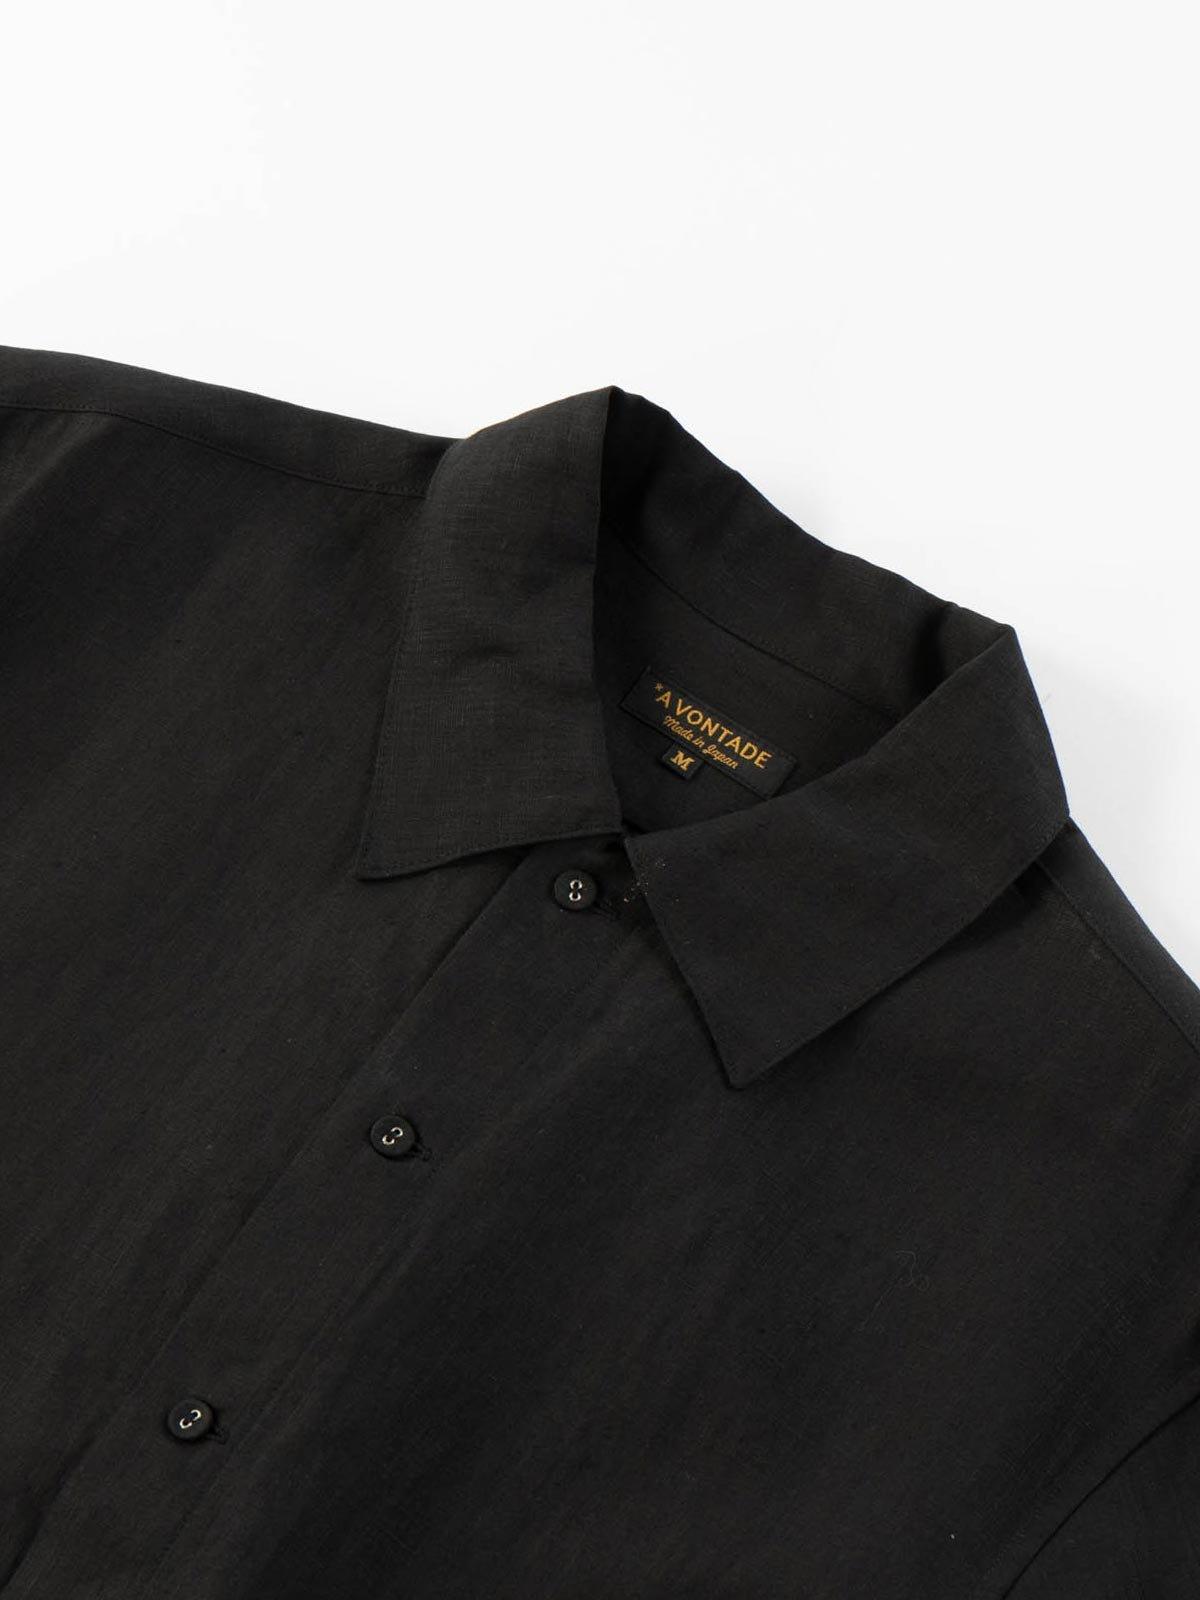 LINEN GARDNER SHIRT BLACK - Image 3